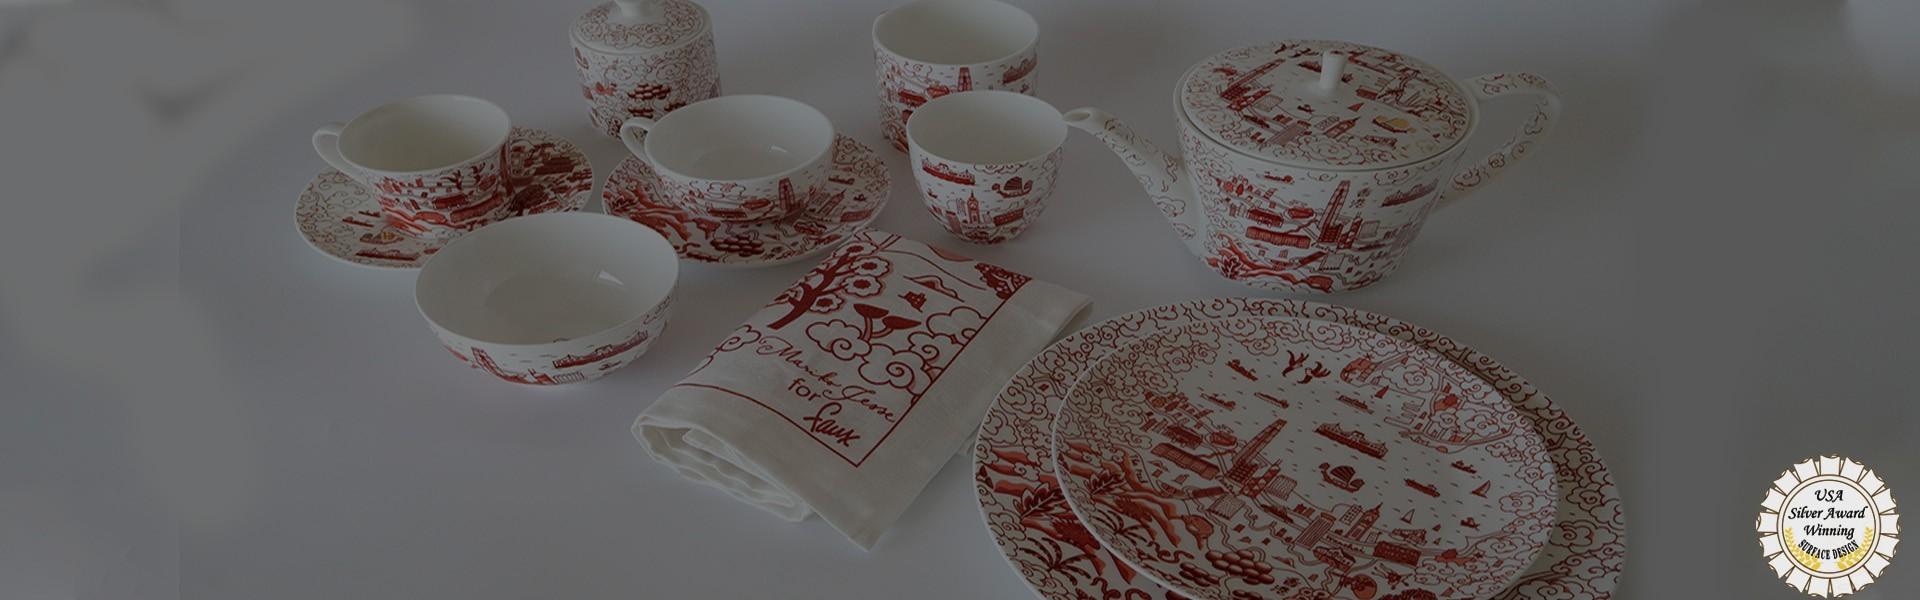 Hong Kong Willow Collection